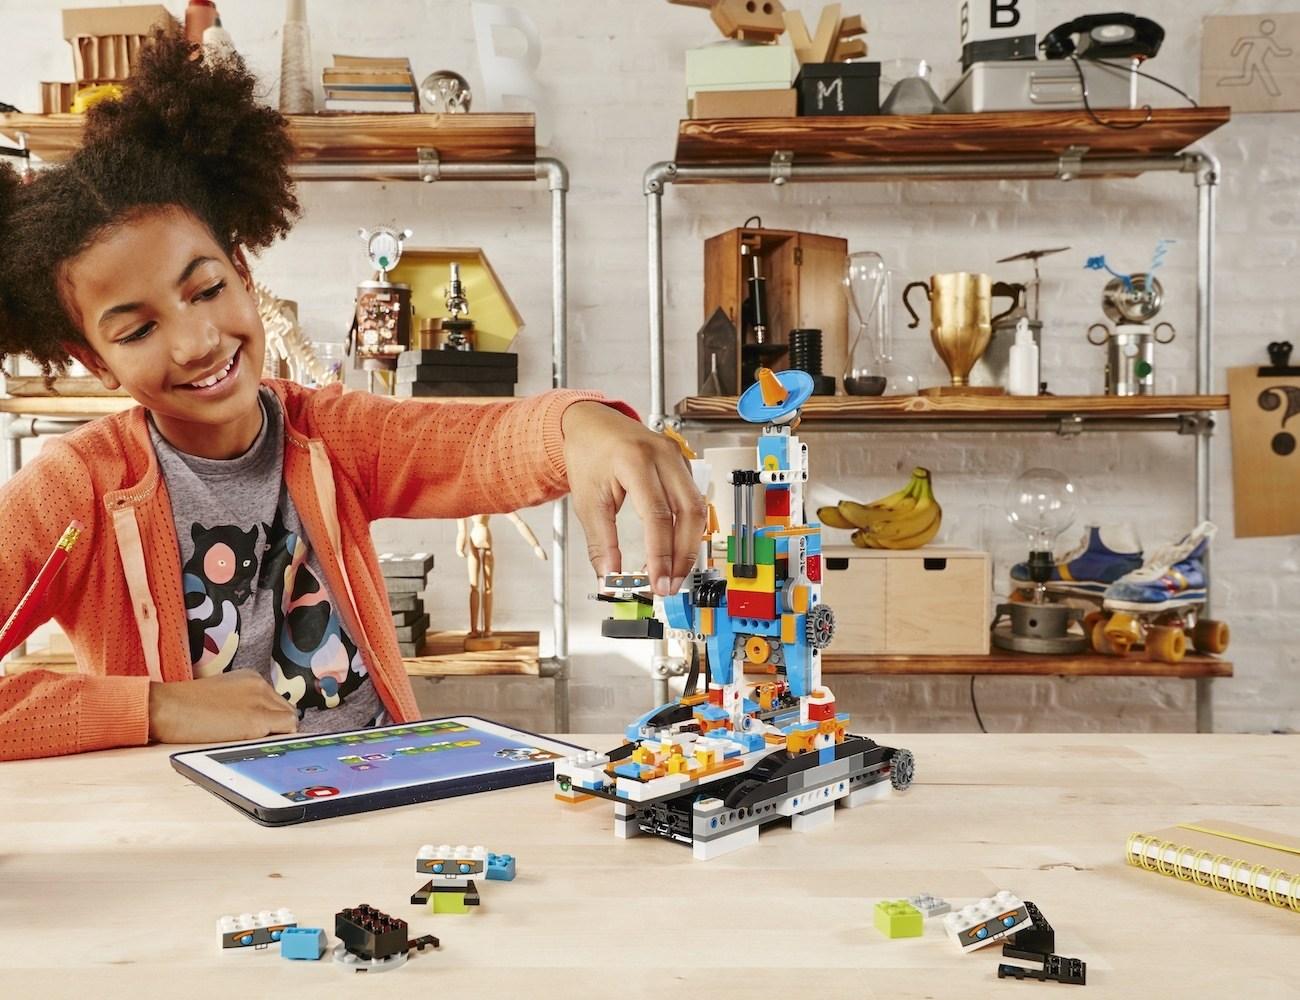 LEGO Boost Robot Building Kit